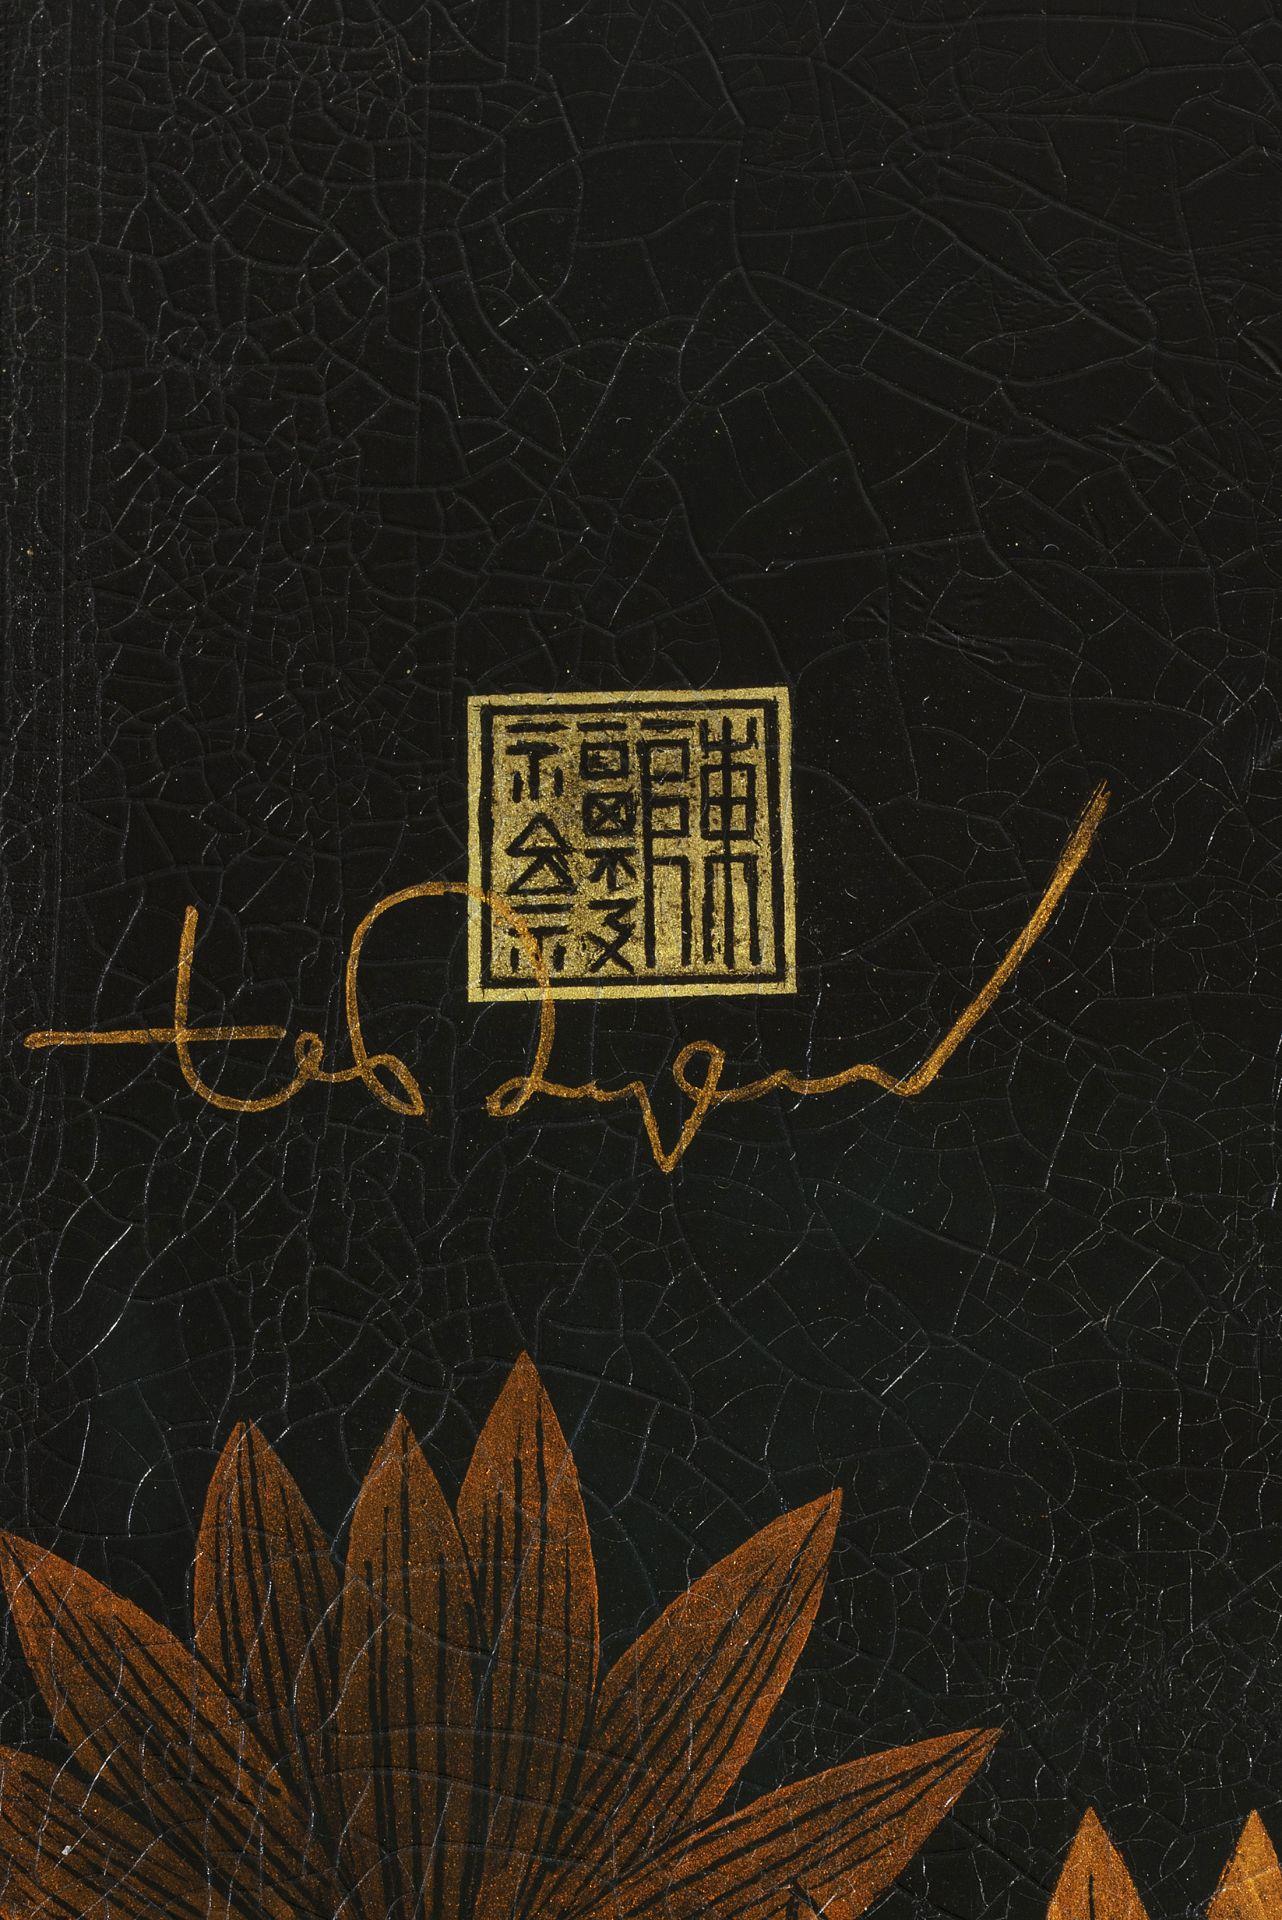 Signature Phuc Duyen Tran